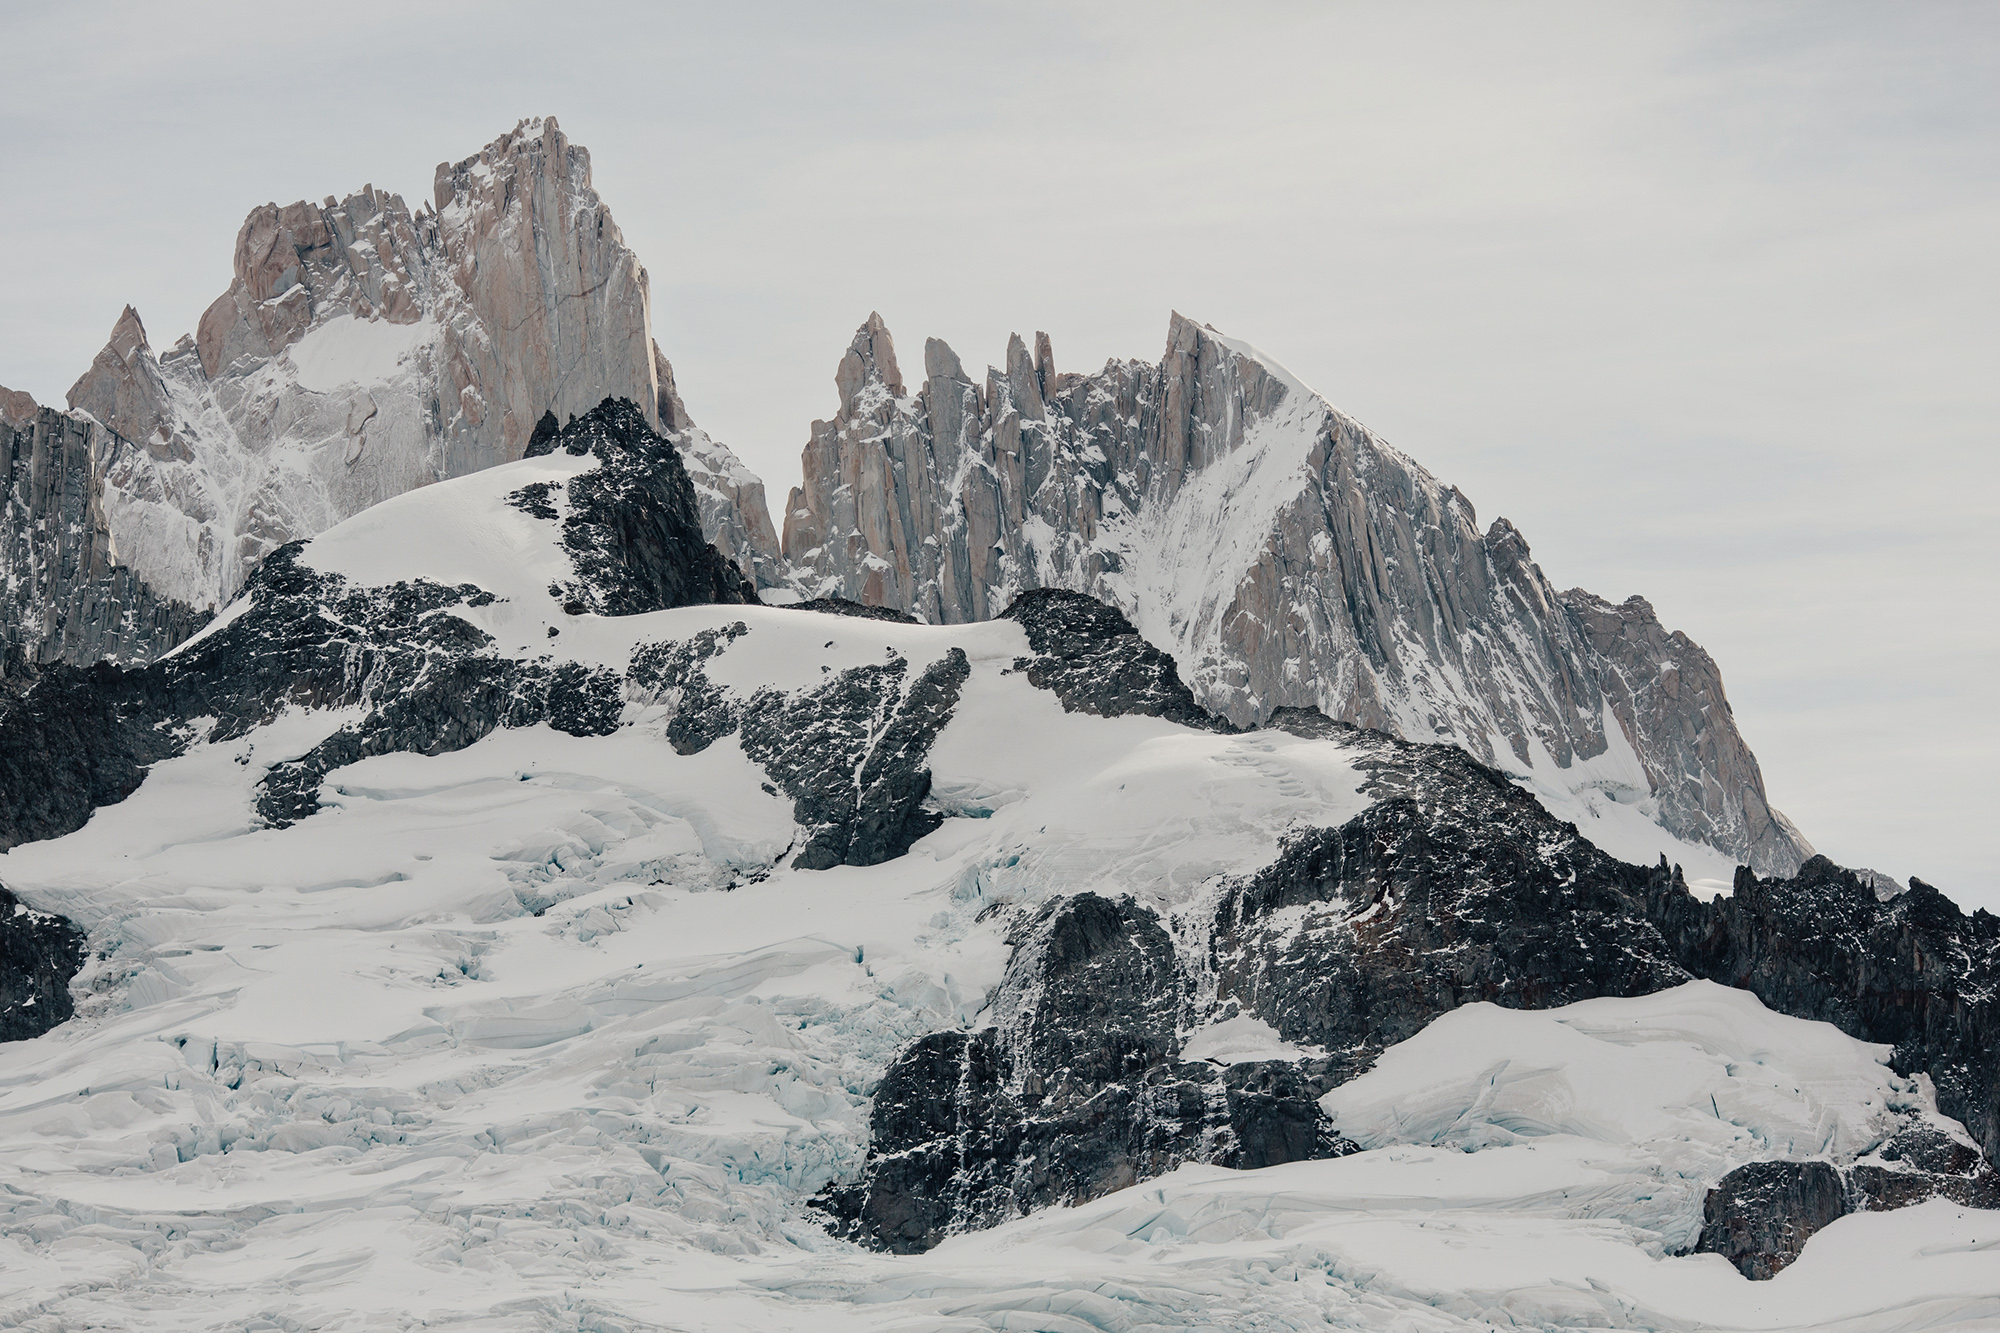 Fitzroy-range-argentina-photography-0008.jpg